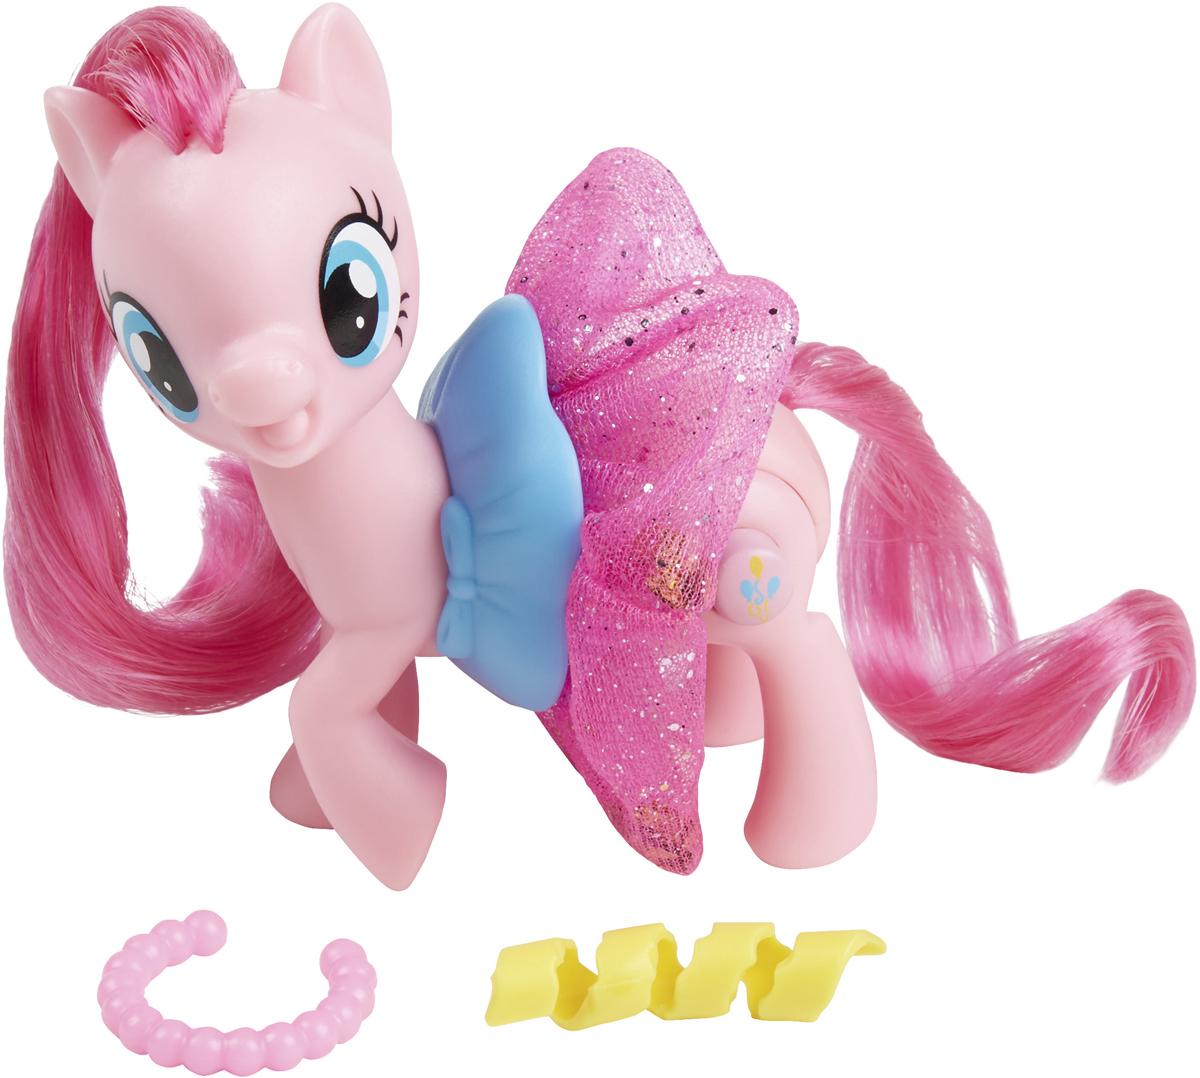 My Little Pony Игрушка Пони в блестящих юбках Pinkie Pie - Фигурки